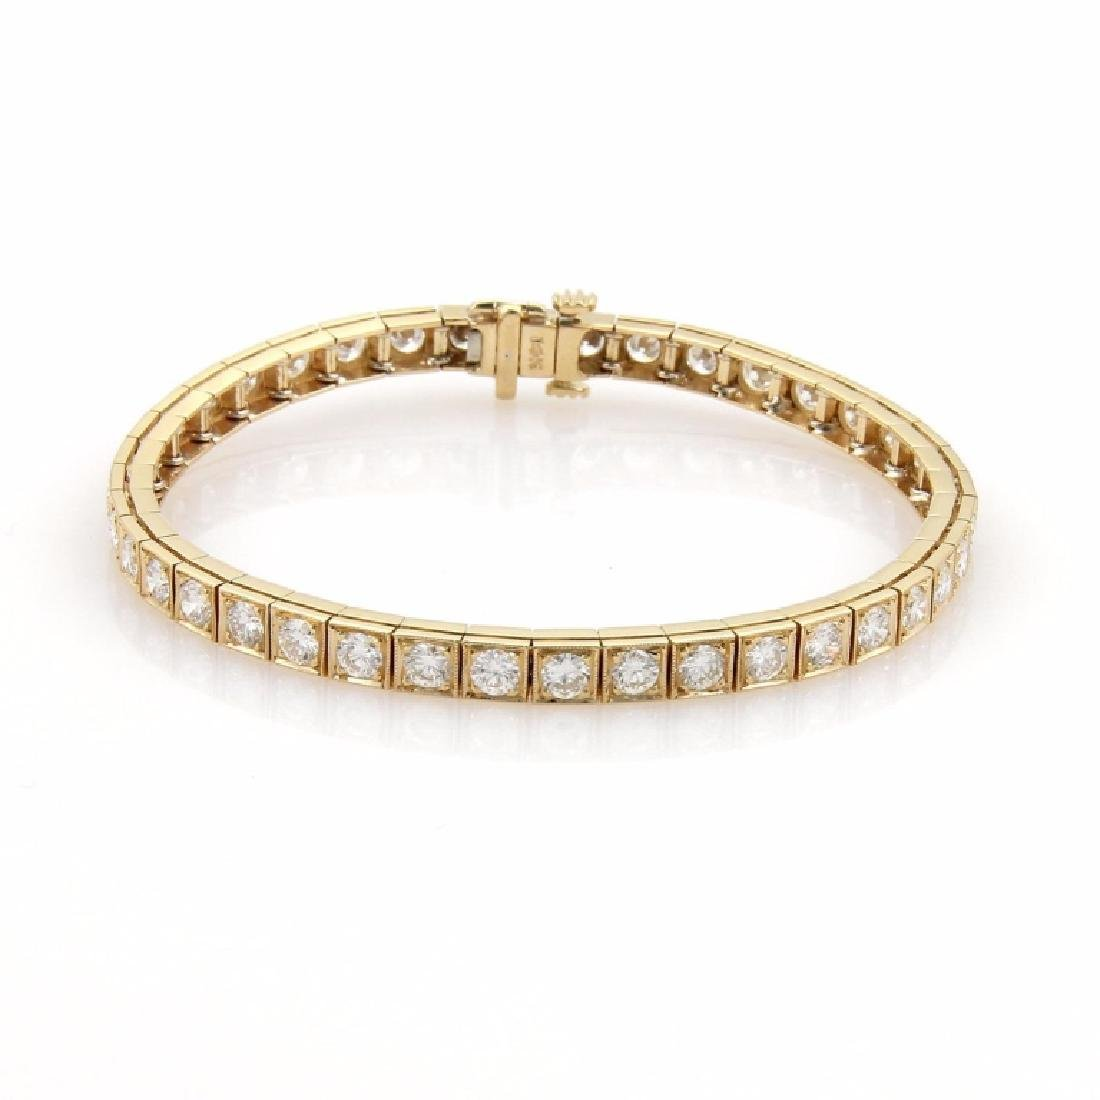 38a084a4a182a 6ct Diamonds 14k Yellow Gold Square Link Bracelet - Feb 09, 2019 ...